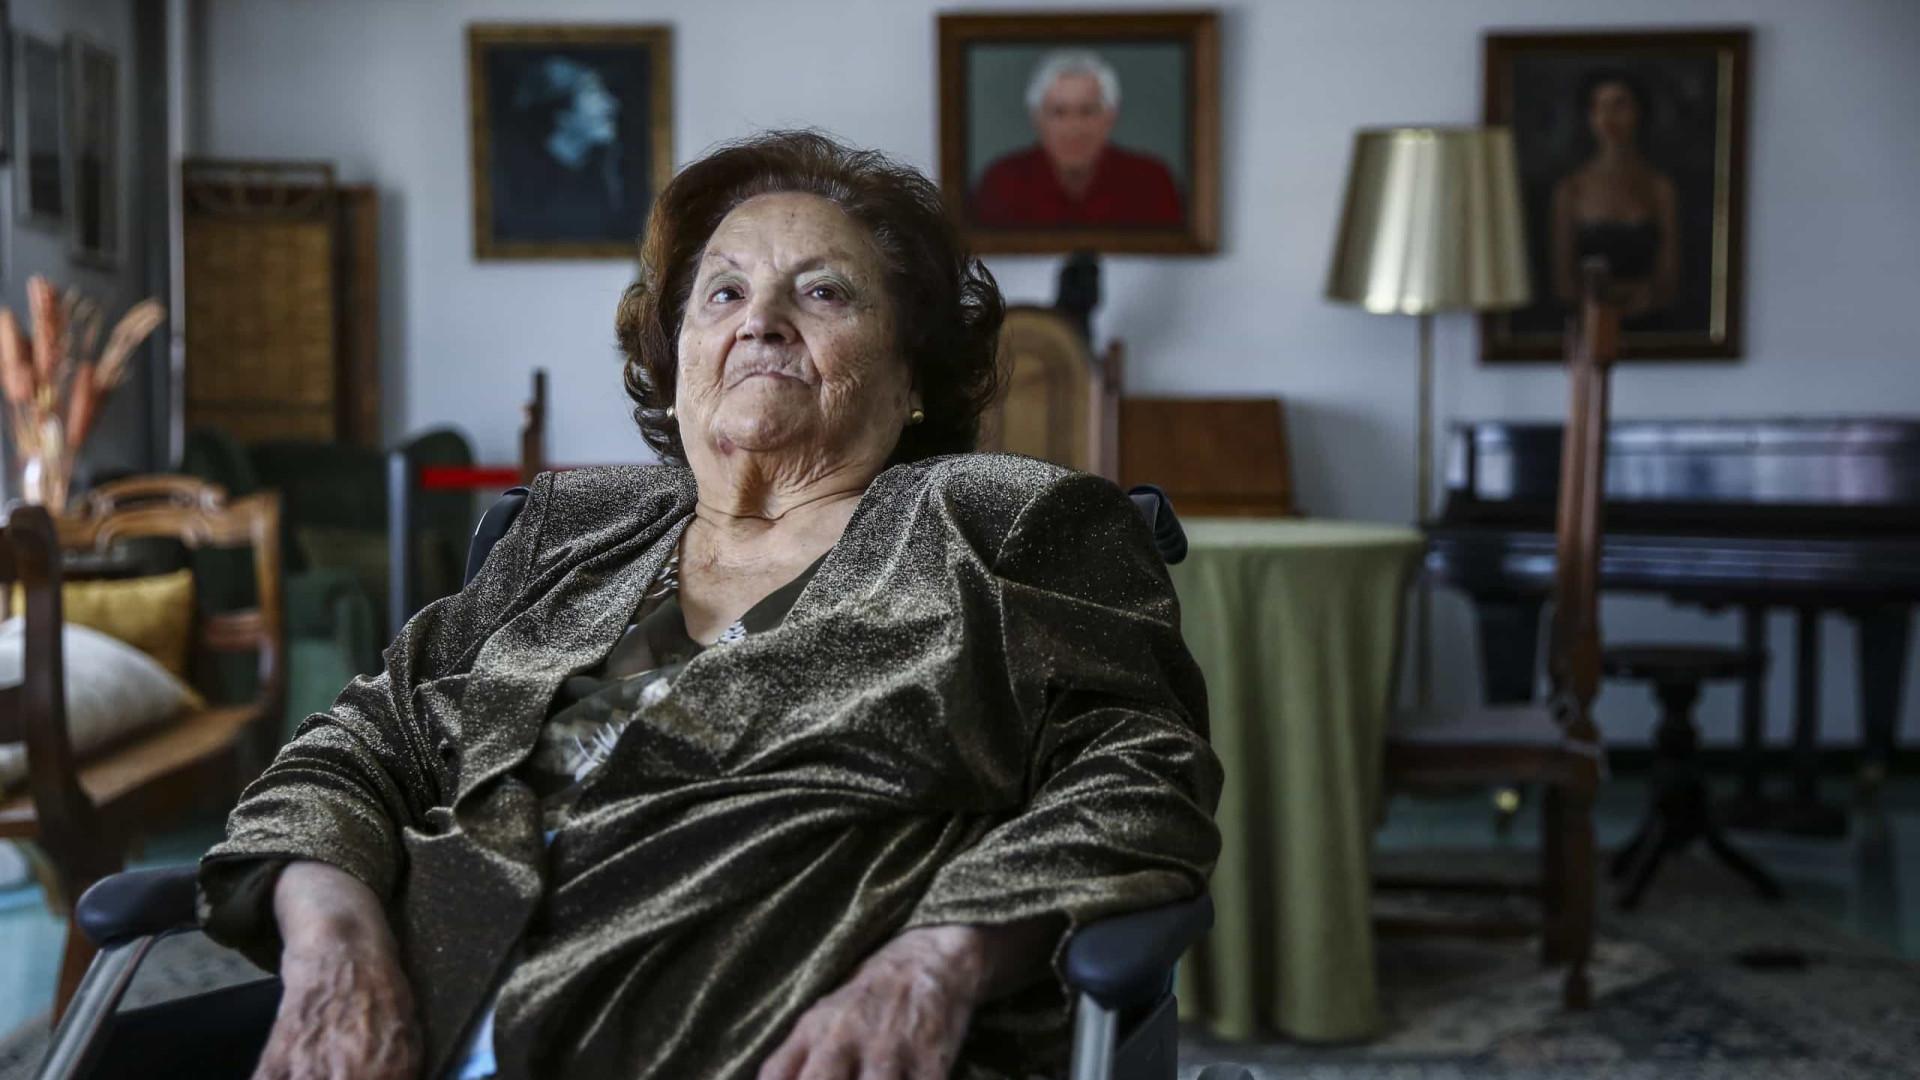 Morreu a fadista Argentina Santos. Tinha 95 anos